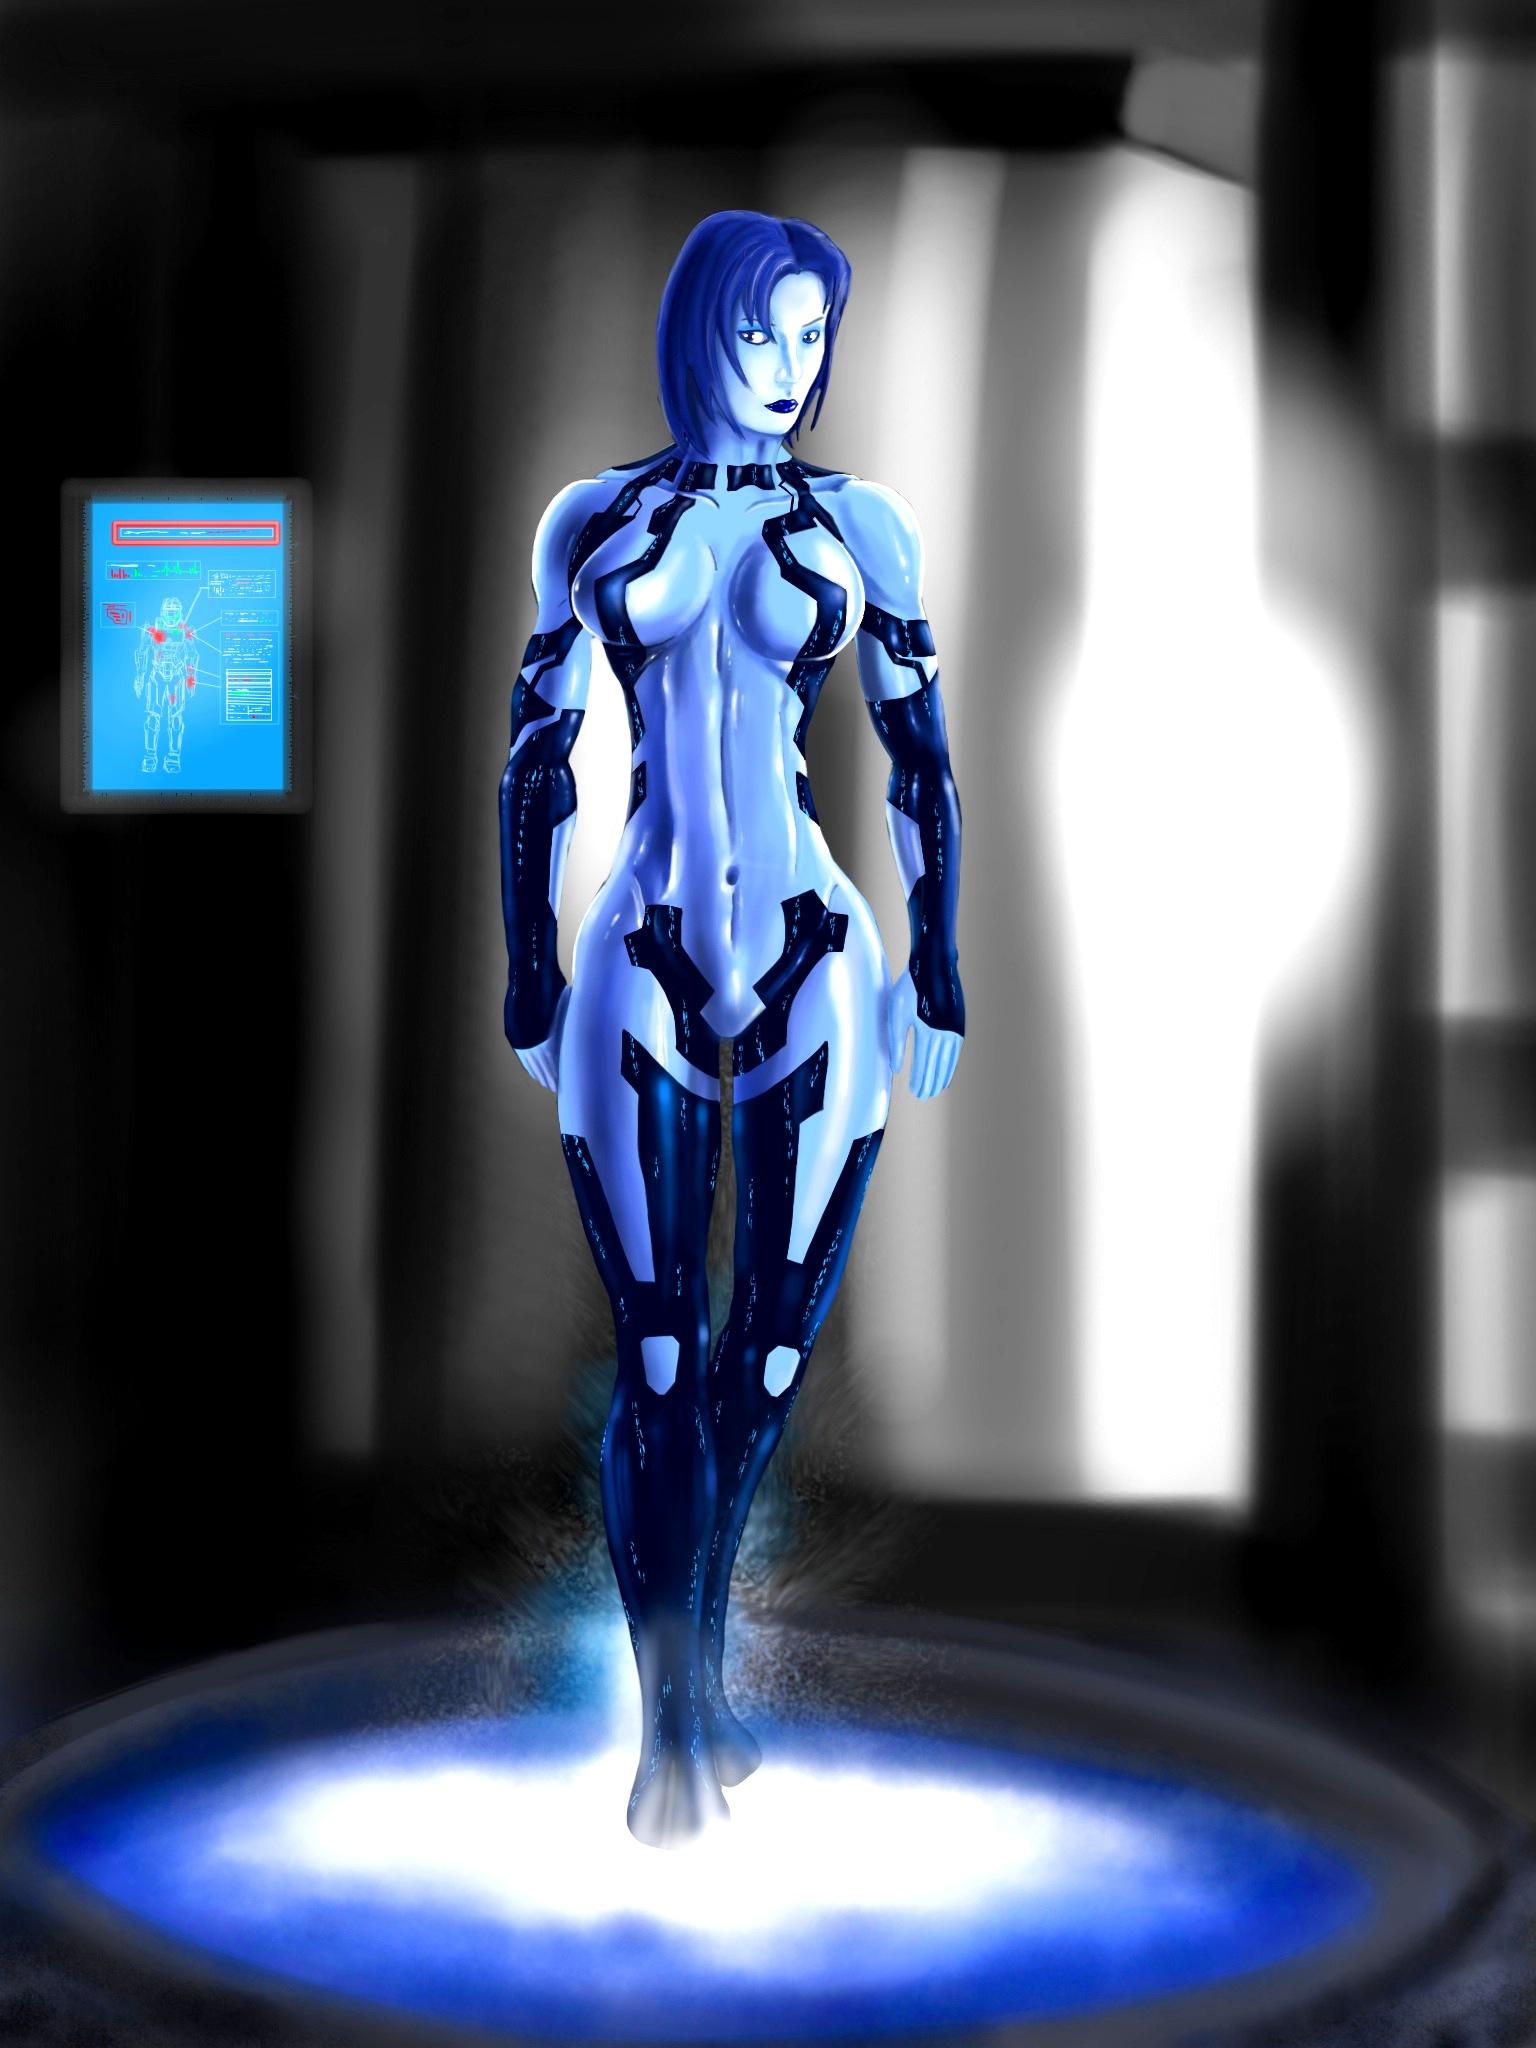 HALO 4 Cortana waits for Chief by jose144 1536x2048